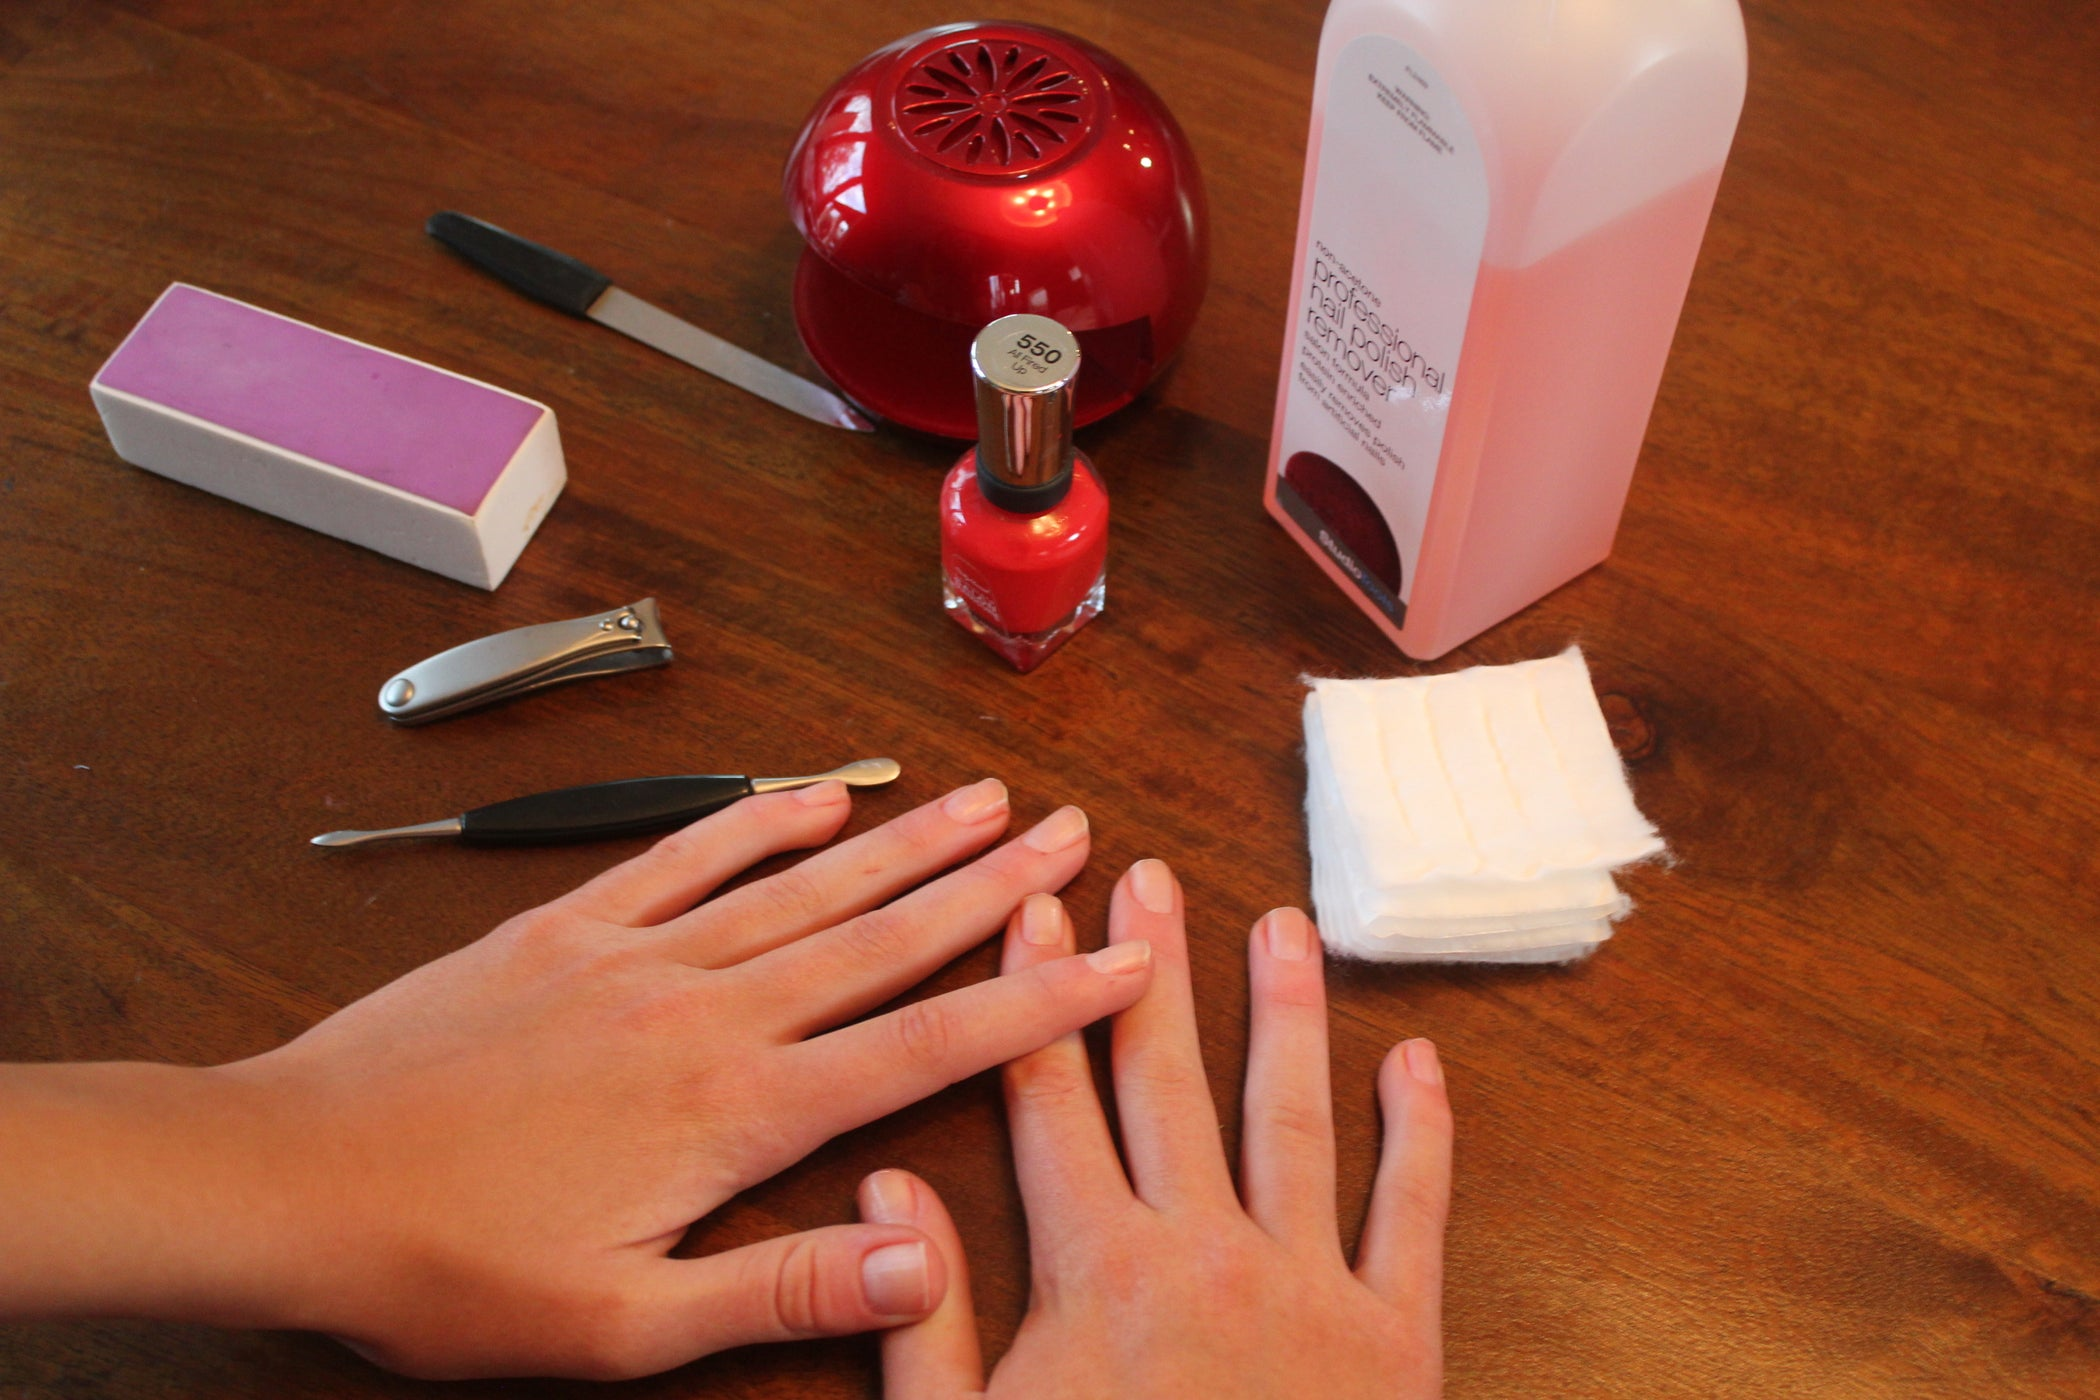 Как красиво накрасить ногти в домашних условиях: уроки с фот